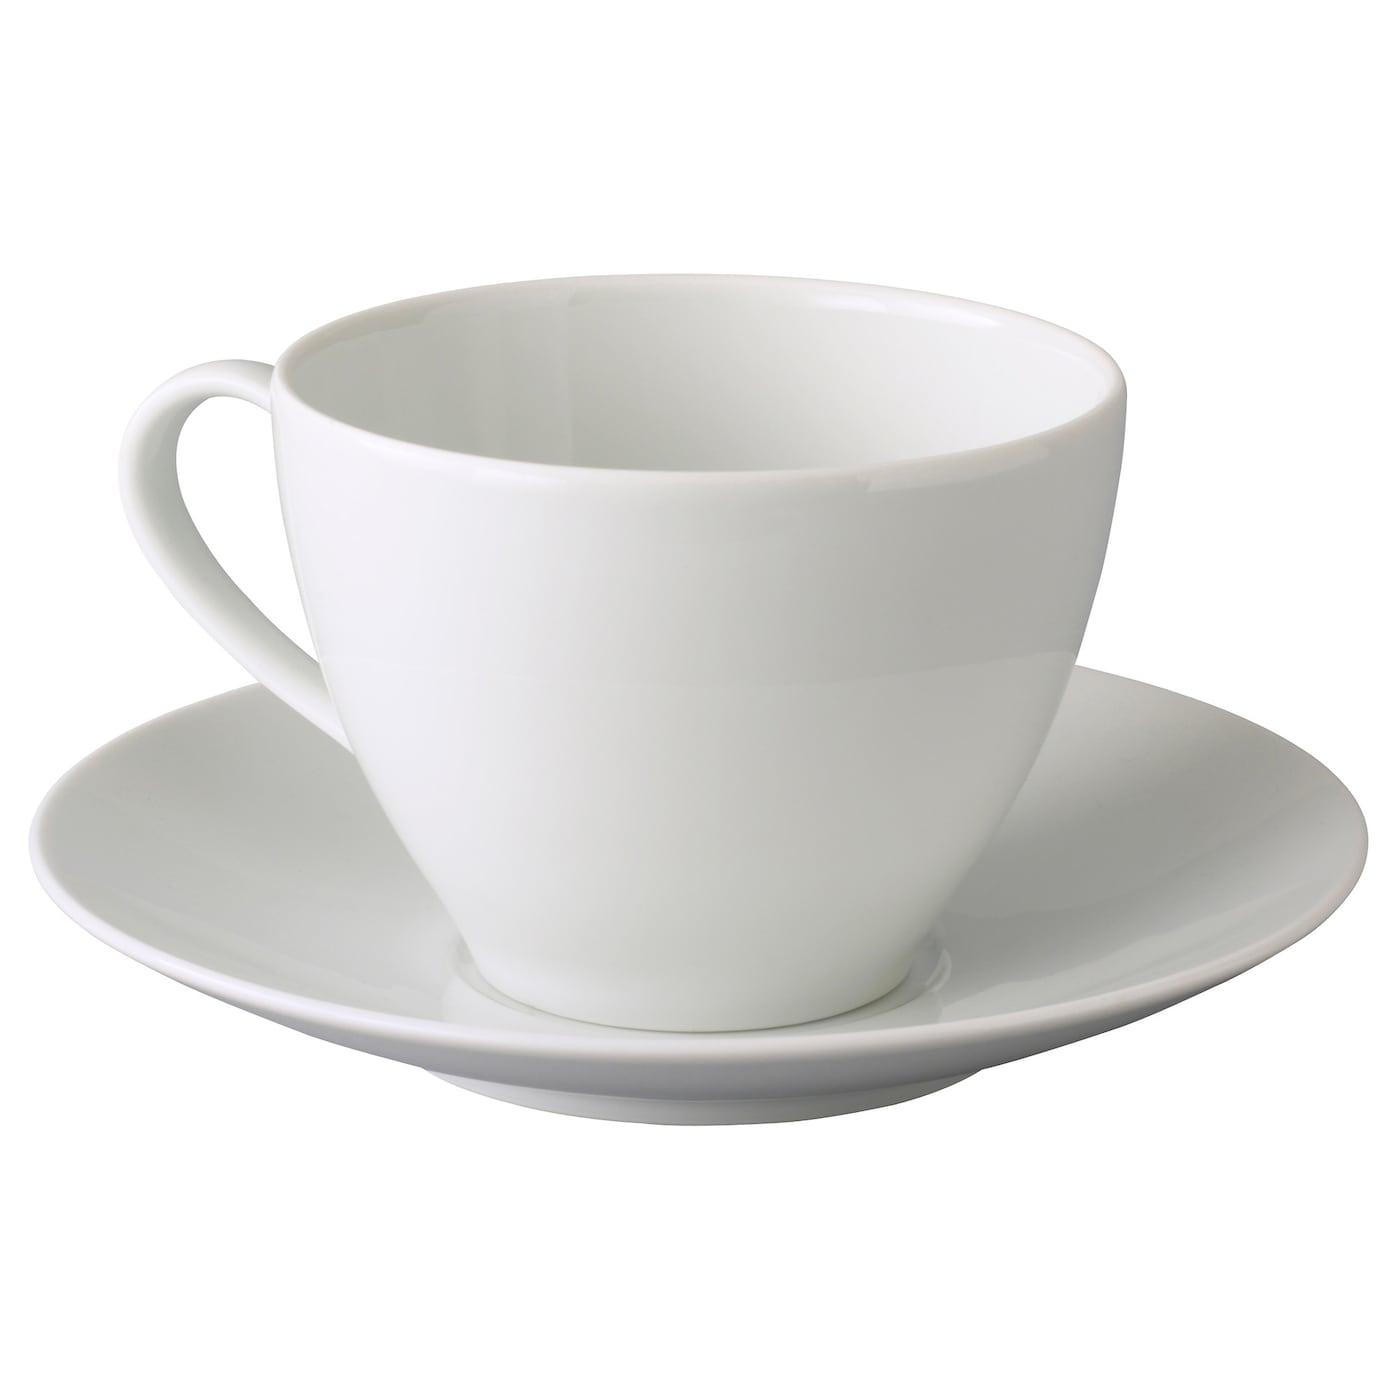 kaffeetassen set yefine ceramic tea set travel old fashion porcelain coffee pots and coffee. Black Bedroom Furniture Sets. Home Design Ideas